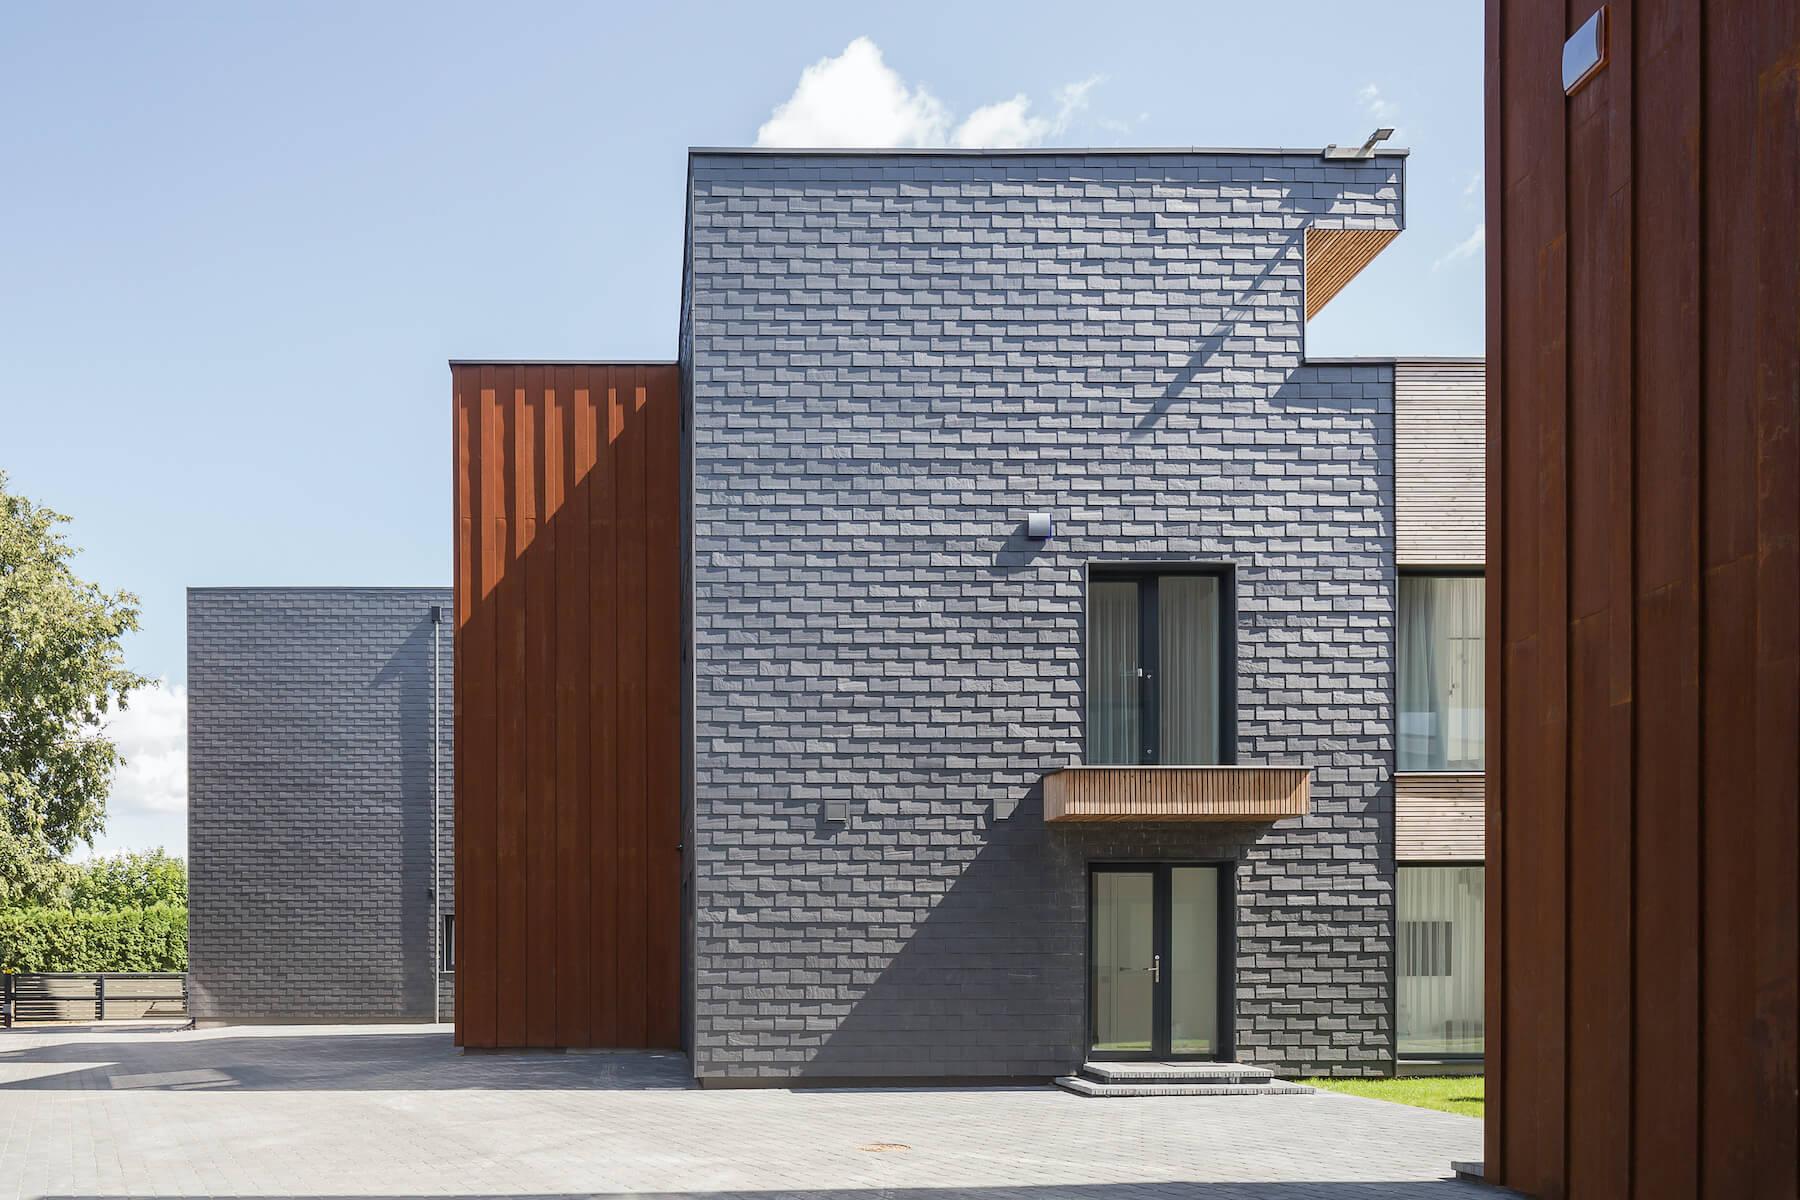 slate tiles on buildings